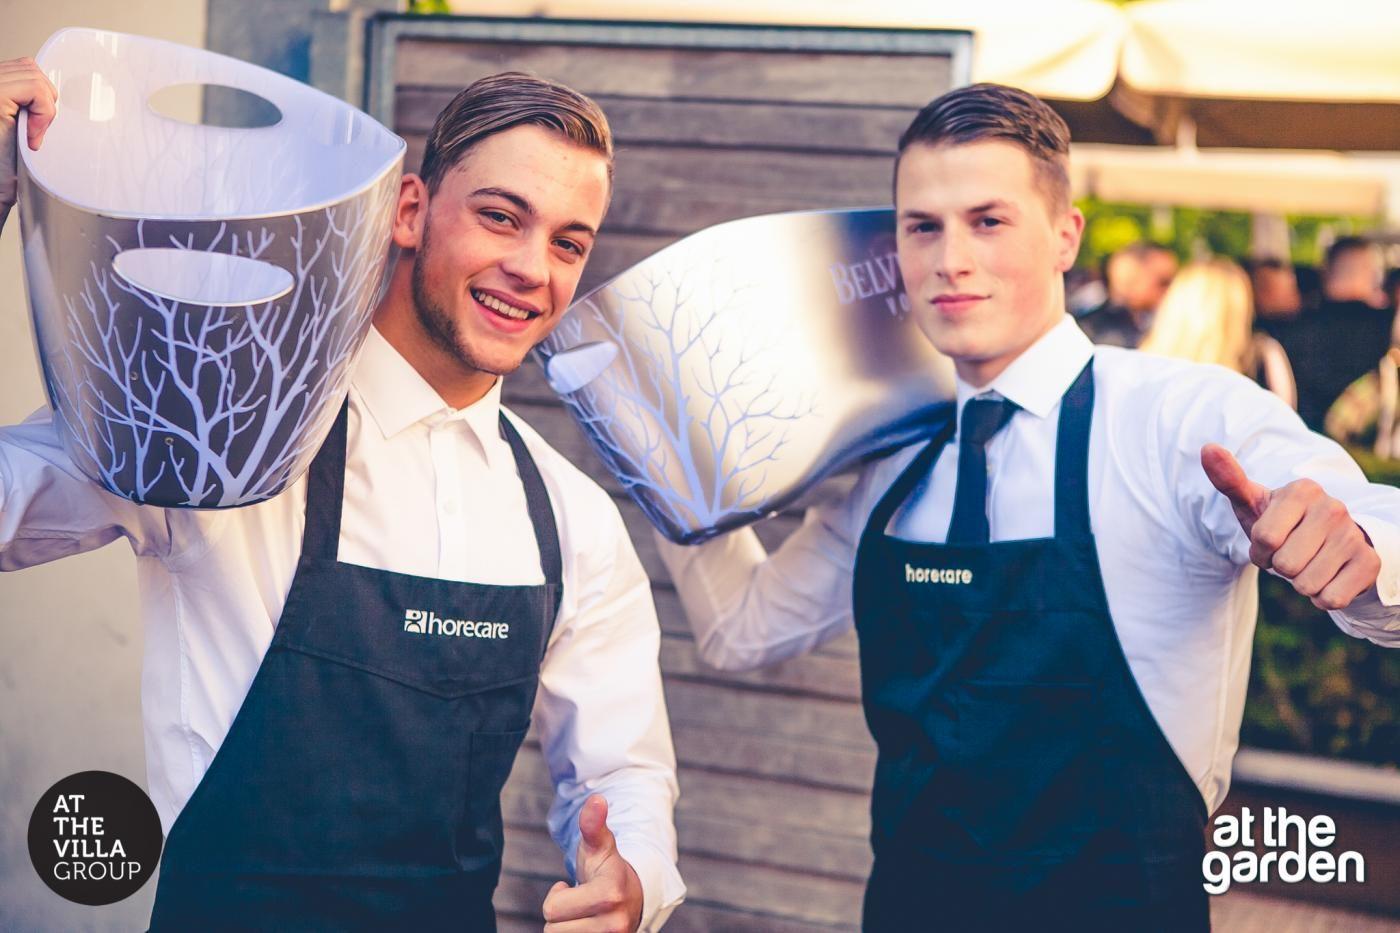 Horecapersoneel horecare events evenementen bartender Maastricht Limburg Heuvelland Parkstad